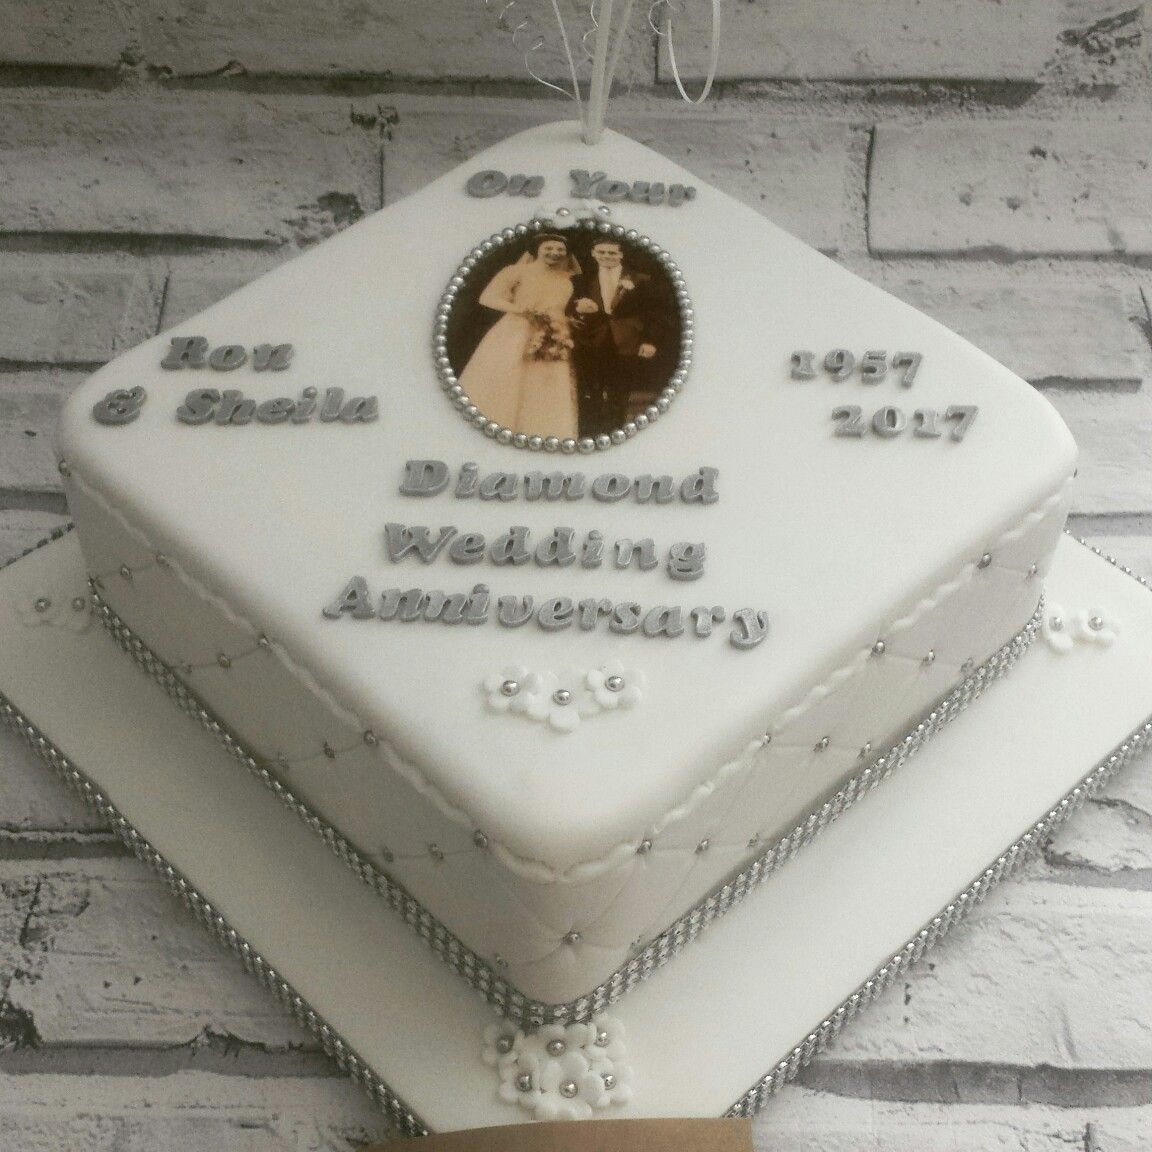 Diamond wedding anniversary cake | Cakes by Lenks:-) | Pinterest ...